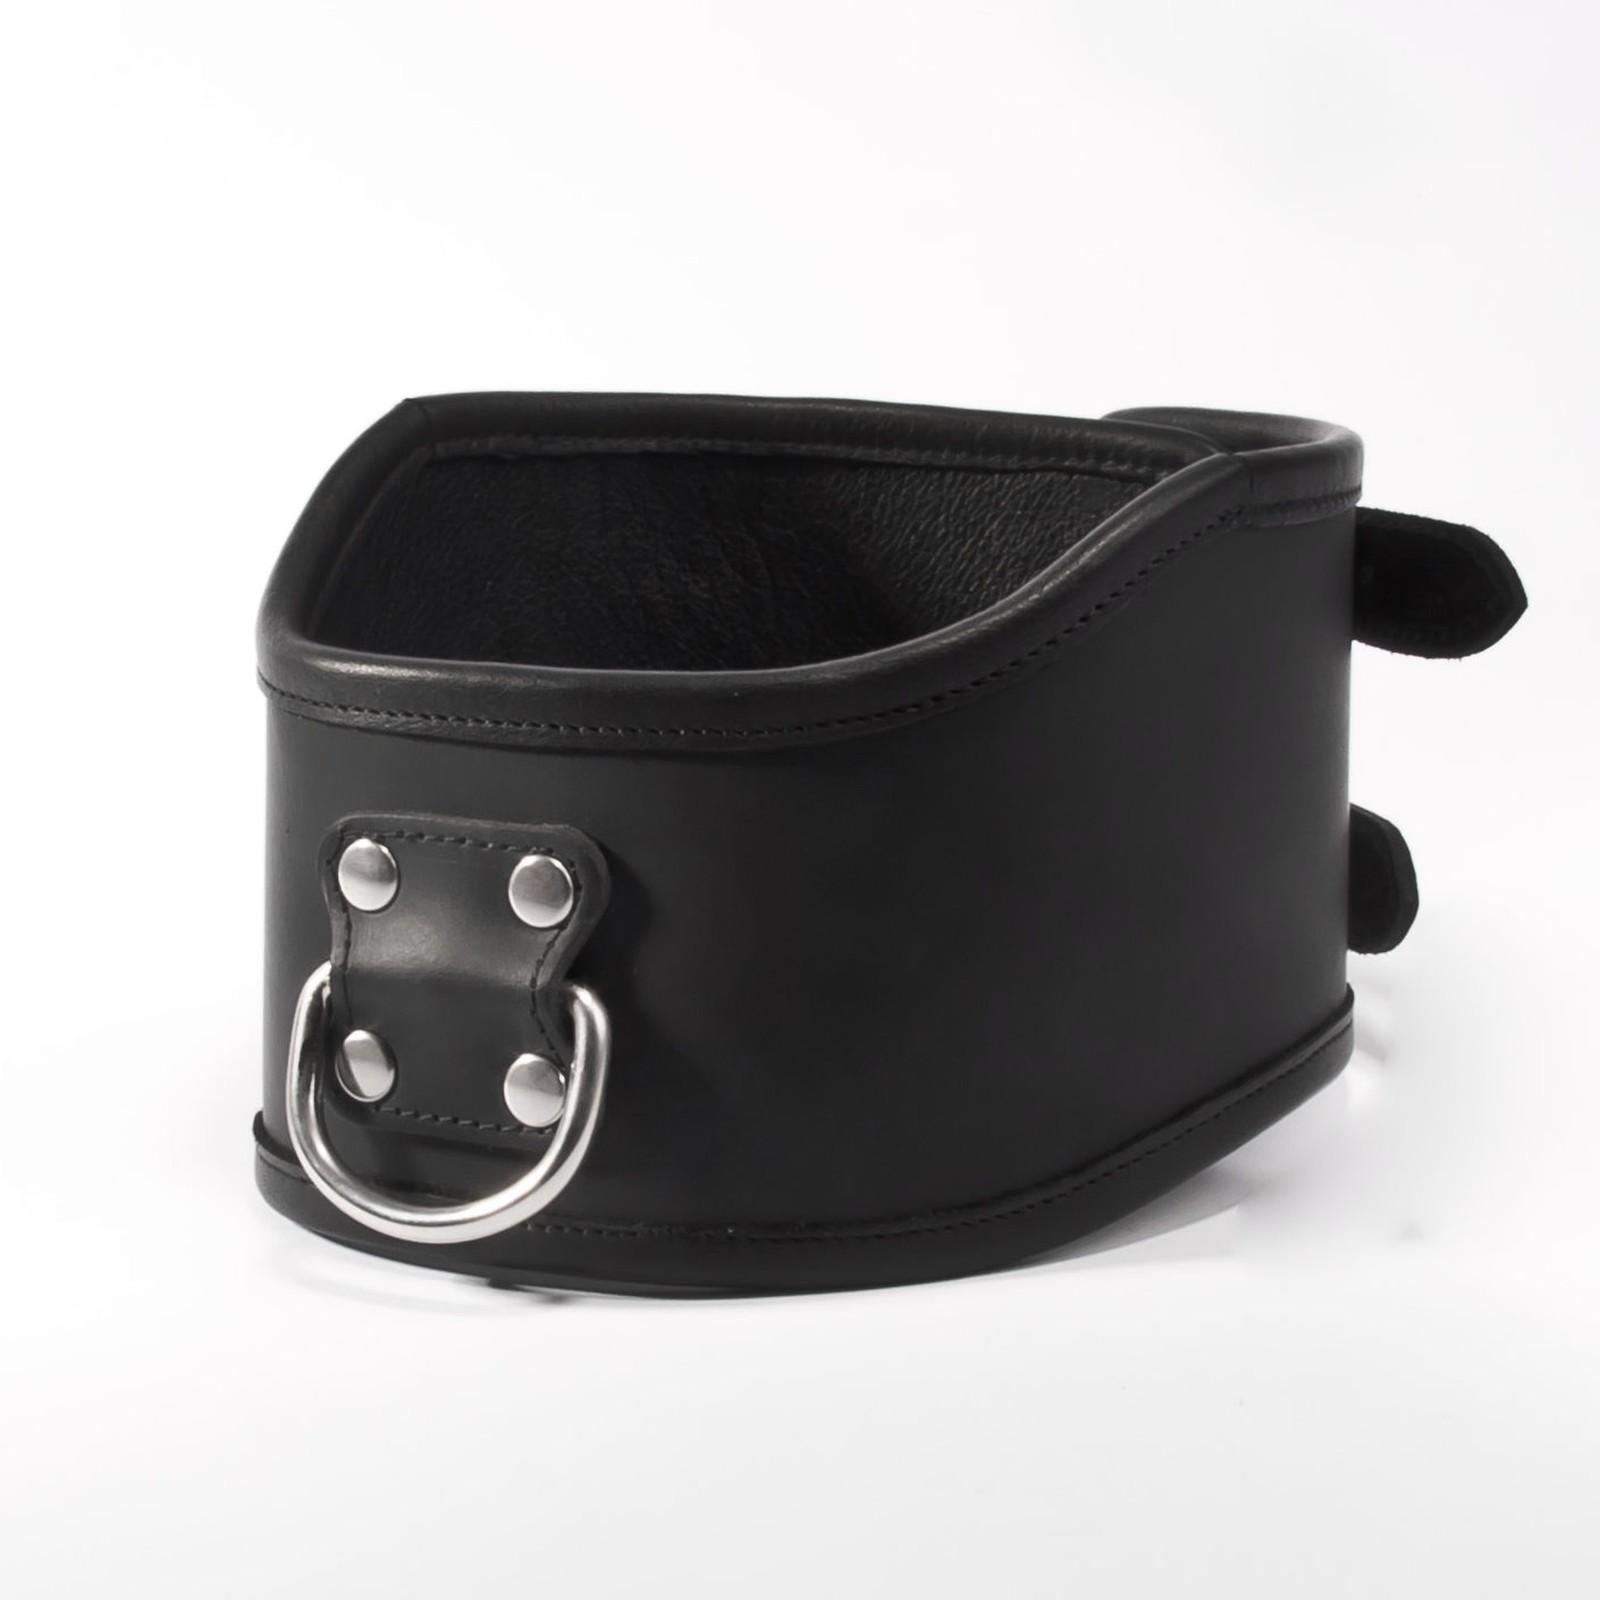 Hohes Halsband - Halskorett aus Leder